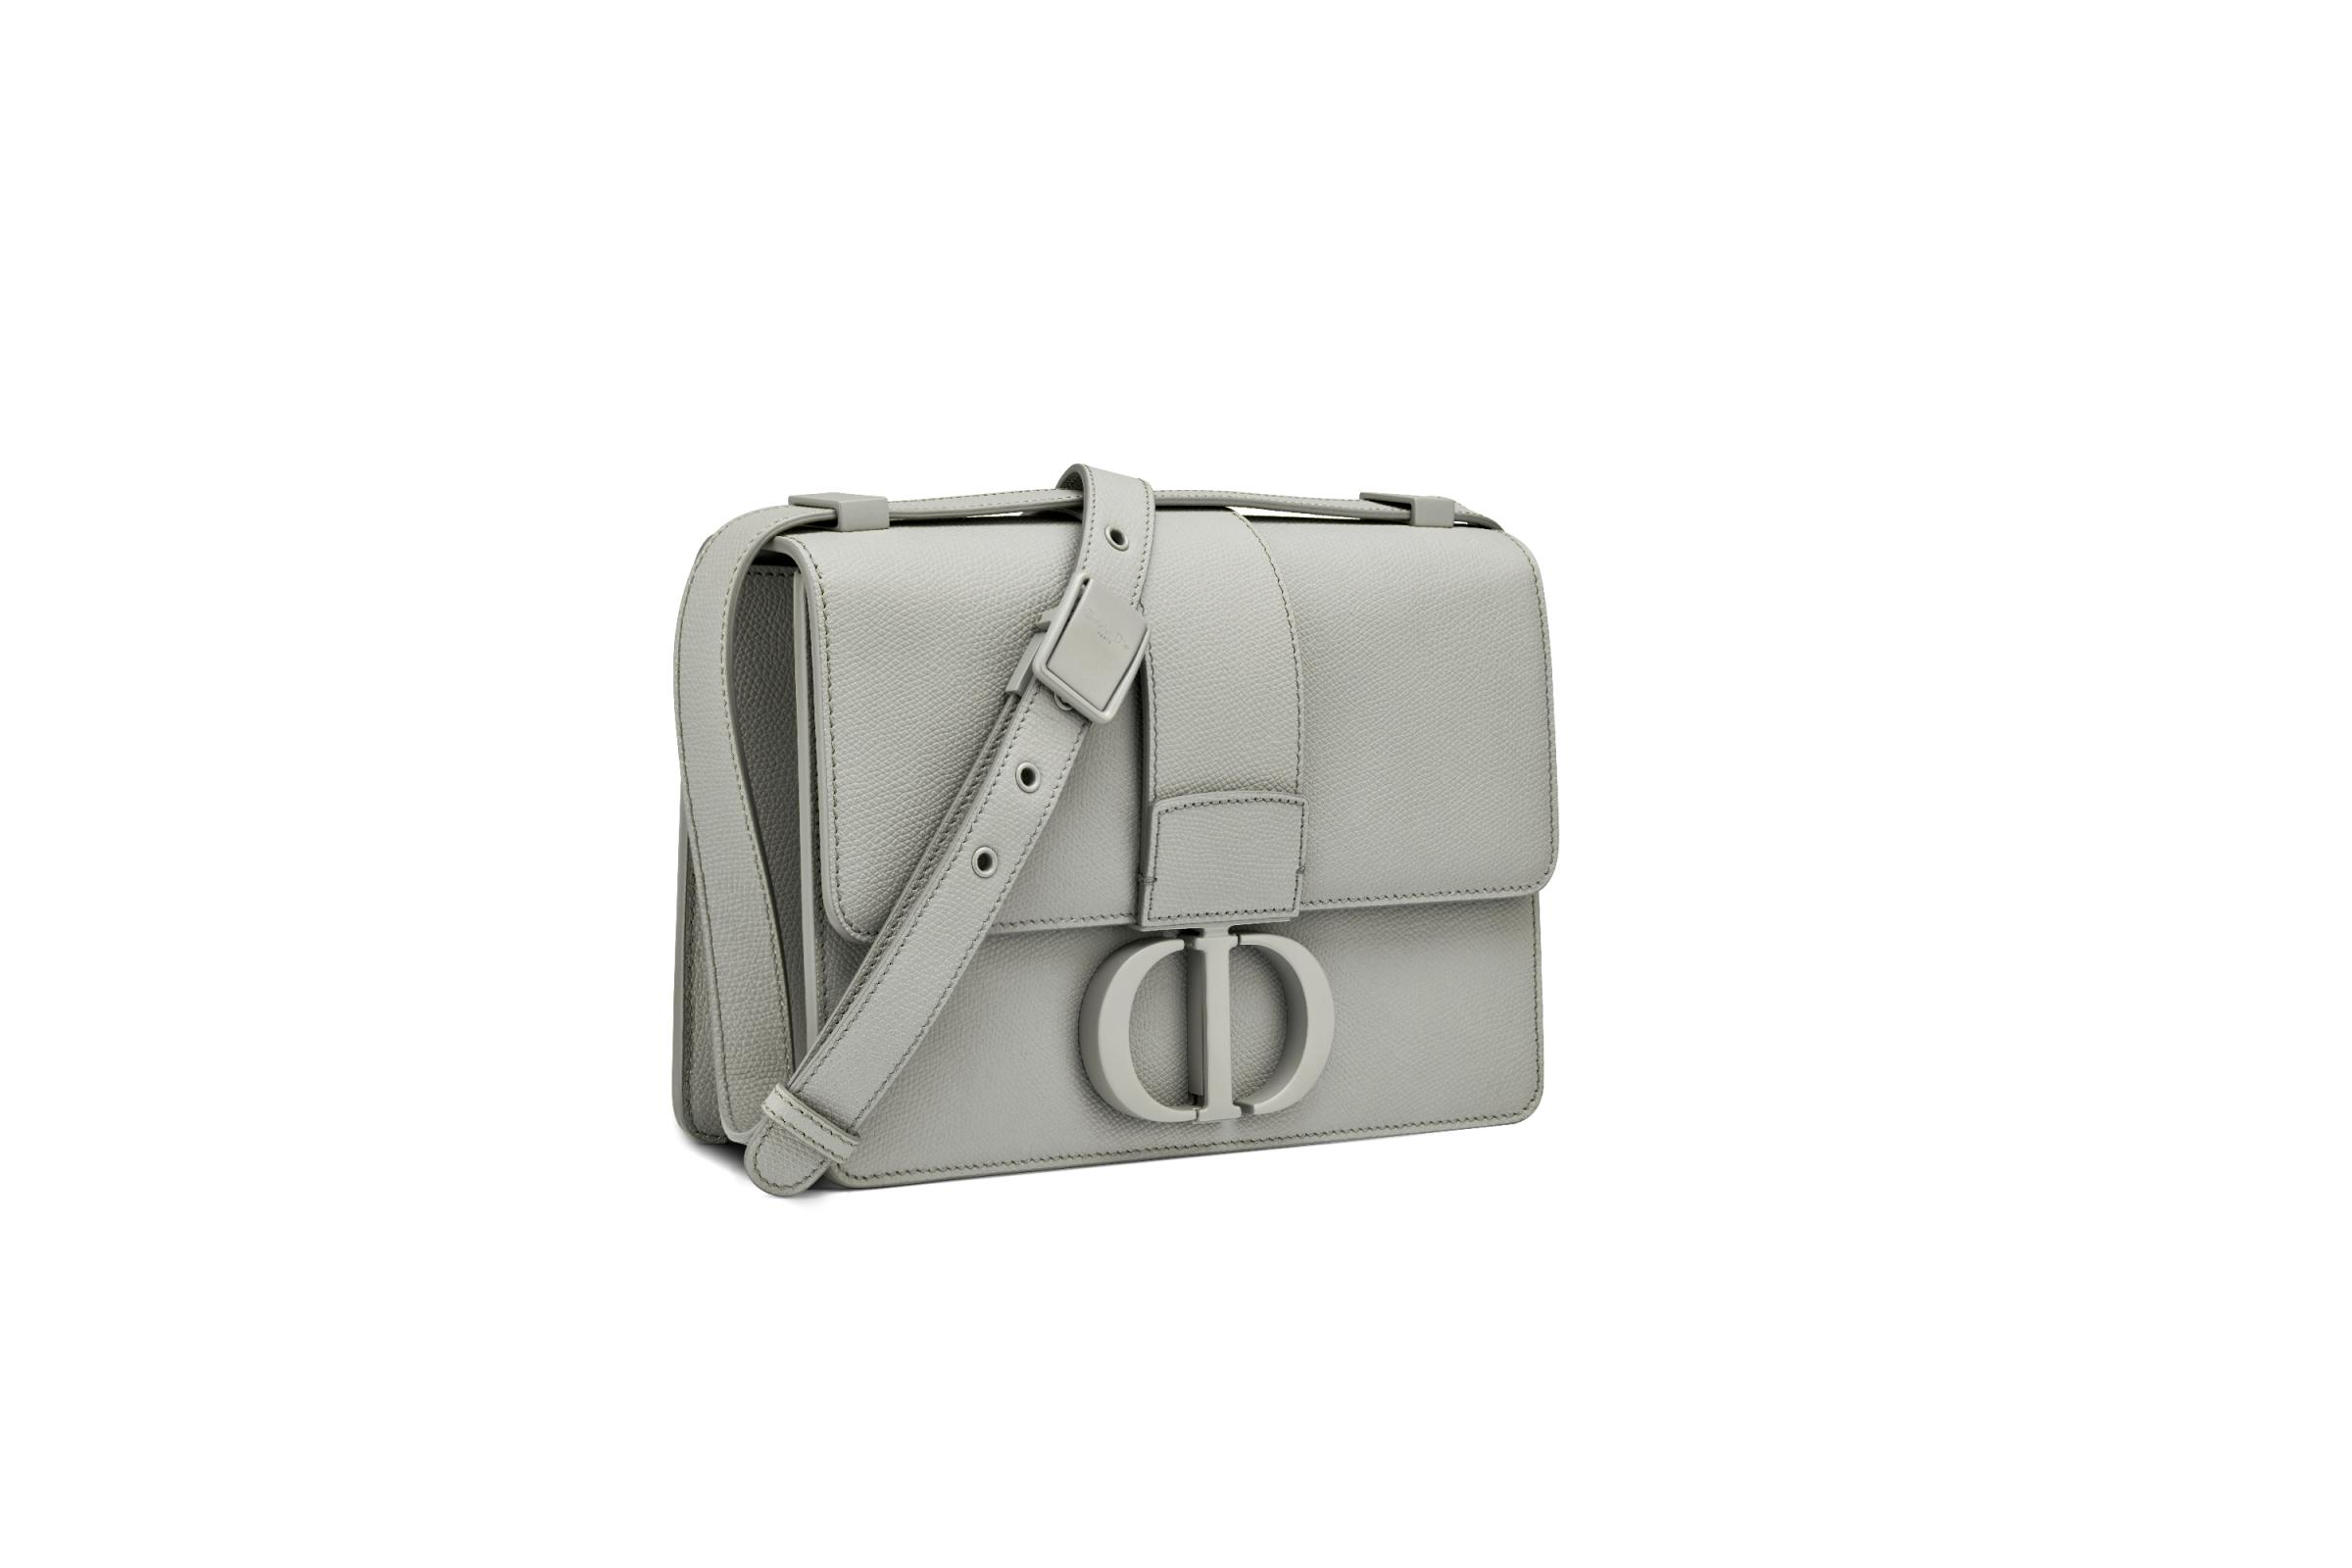 dior-2020-ultra-matte-handbags-saddle-bag-lady-dior-30-montaigne